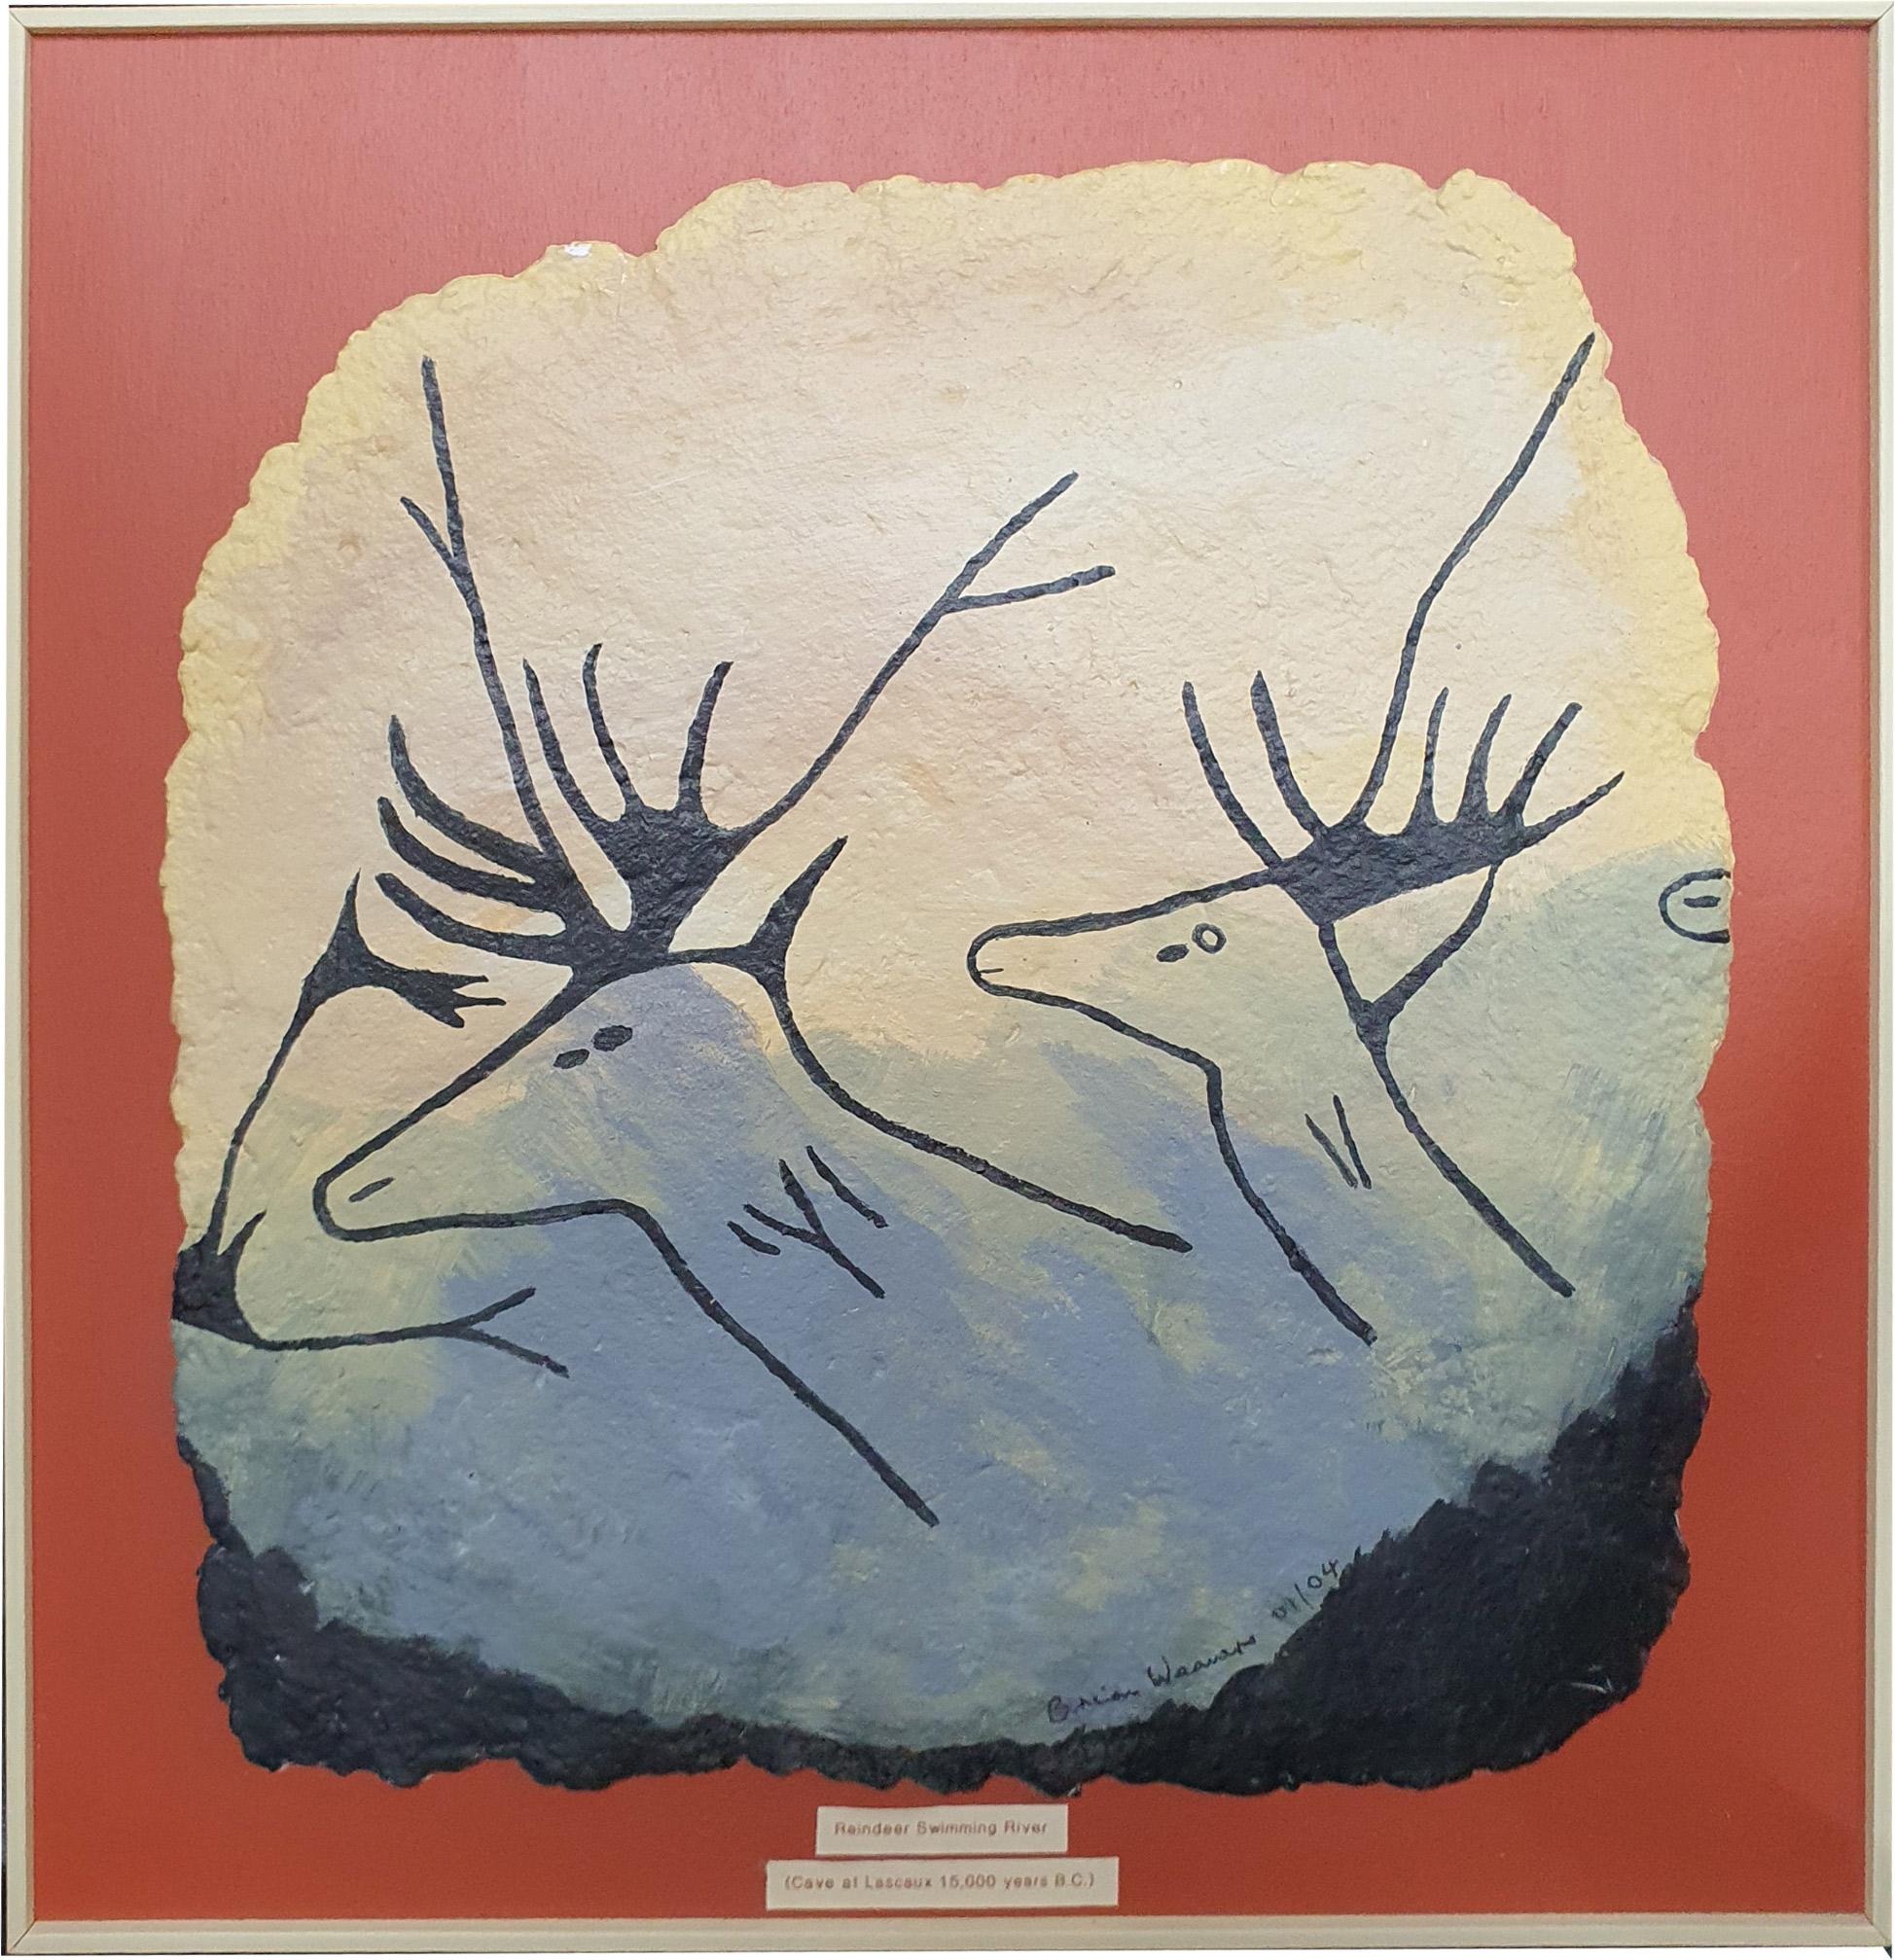 Cave Painting no. 5 - Reinedeer Swimming River - Brian Weavers Artist